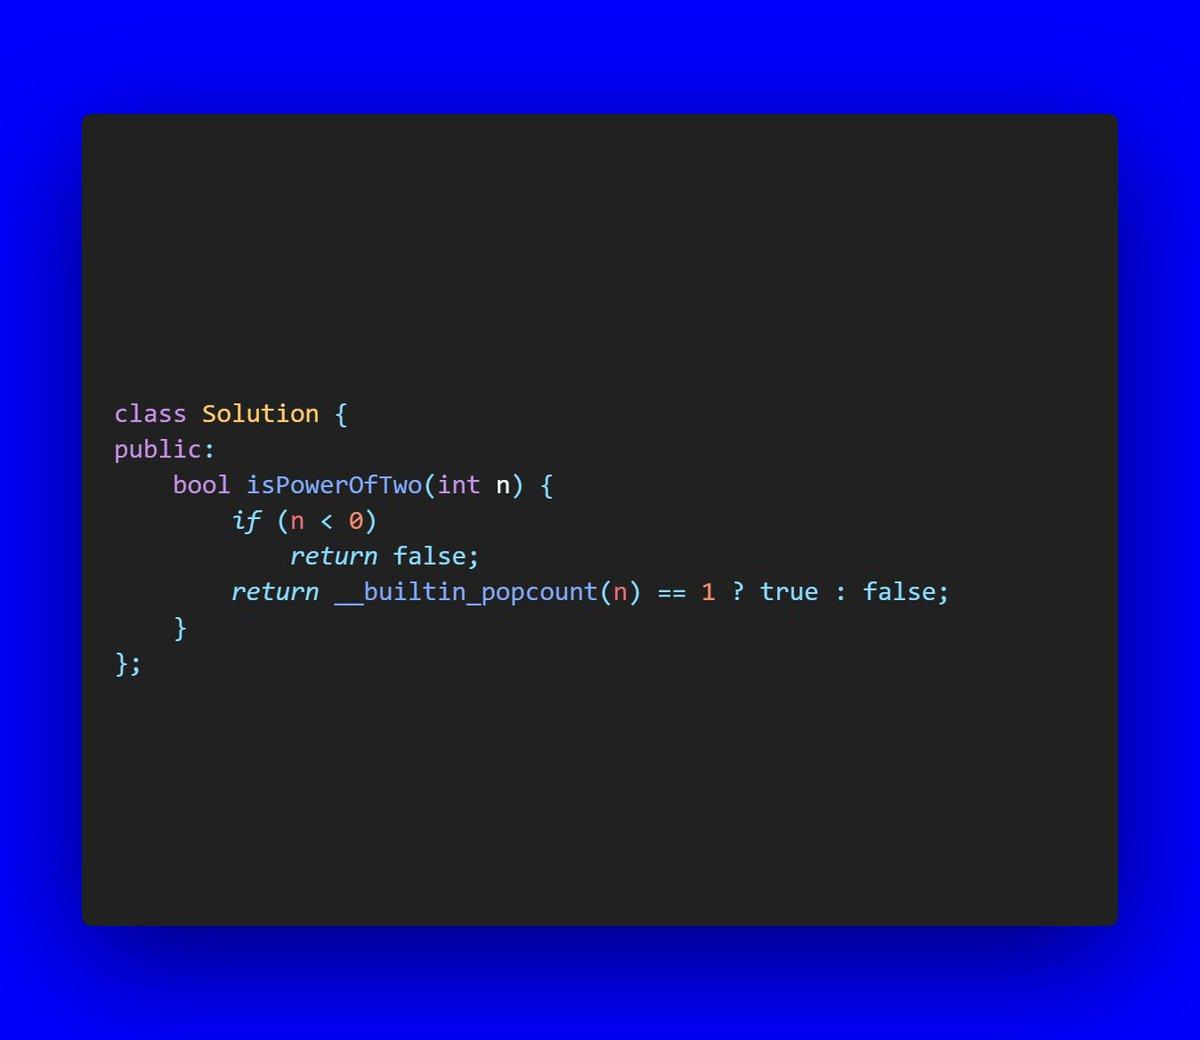 Day 88: LeetCode: 231. Power of Two  #coding #everyday #coder #codinglife #daily #myday #programminglife #programmer #screen #developer #love #100daysofcode #programming #program #365codingphasechallenge #programmer #code #codingphase #codingpicspic.twitter.com/PZqjSHfEuR